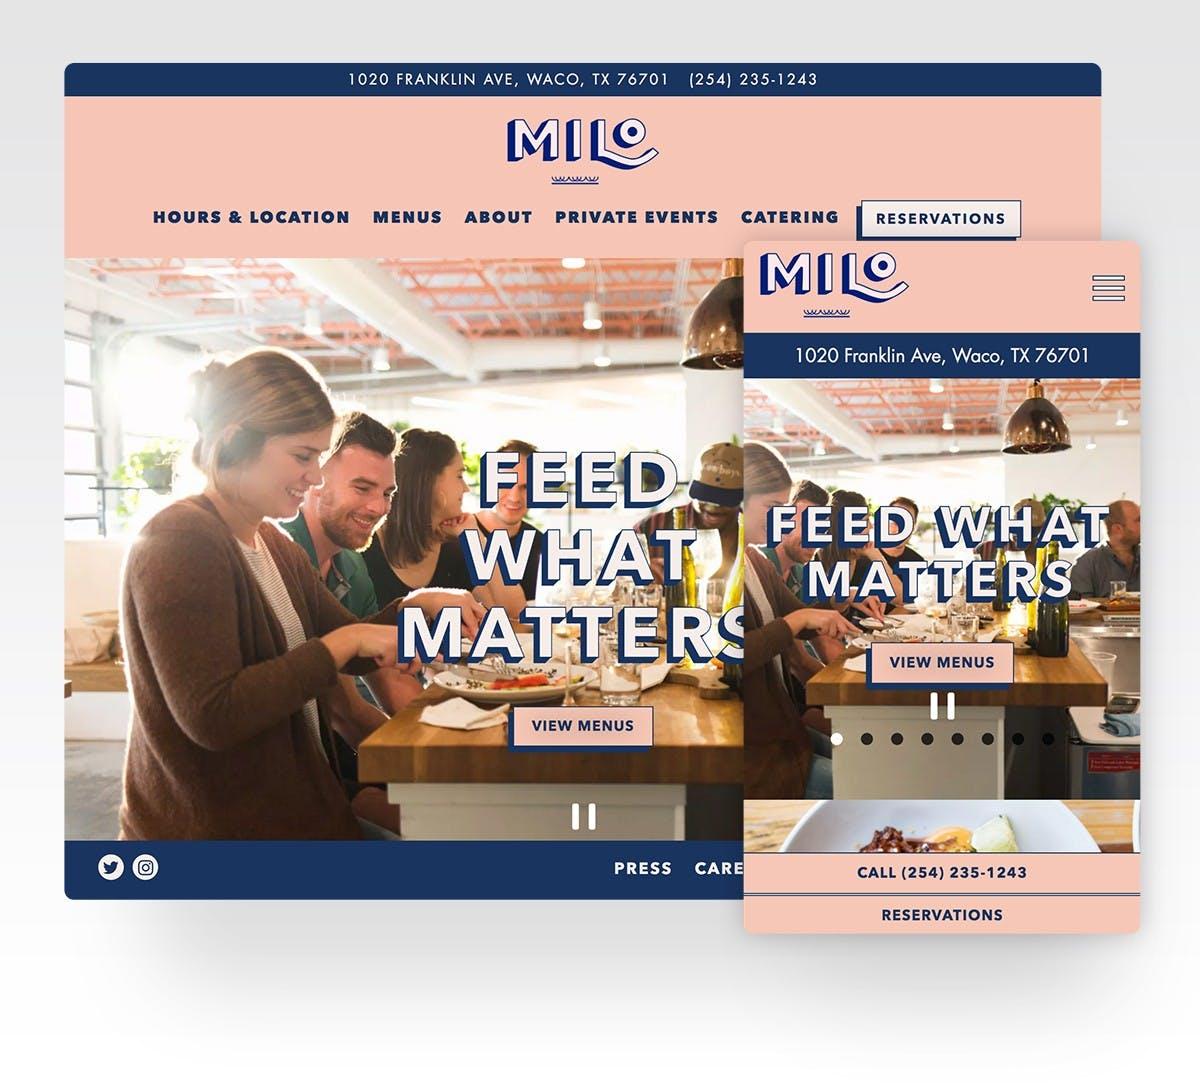 The website for Milo